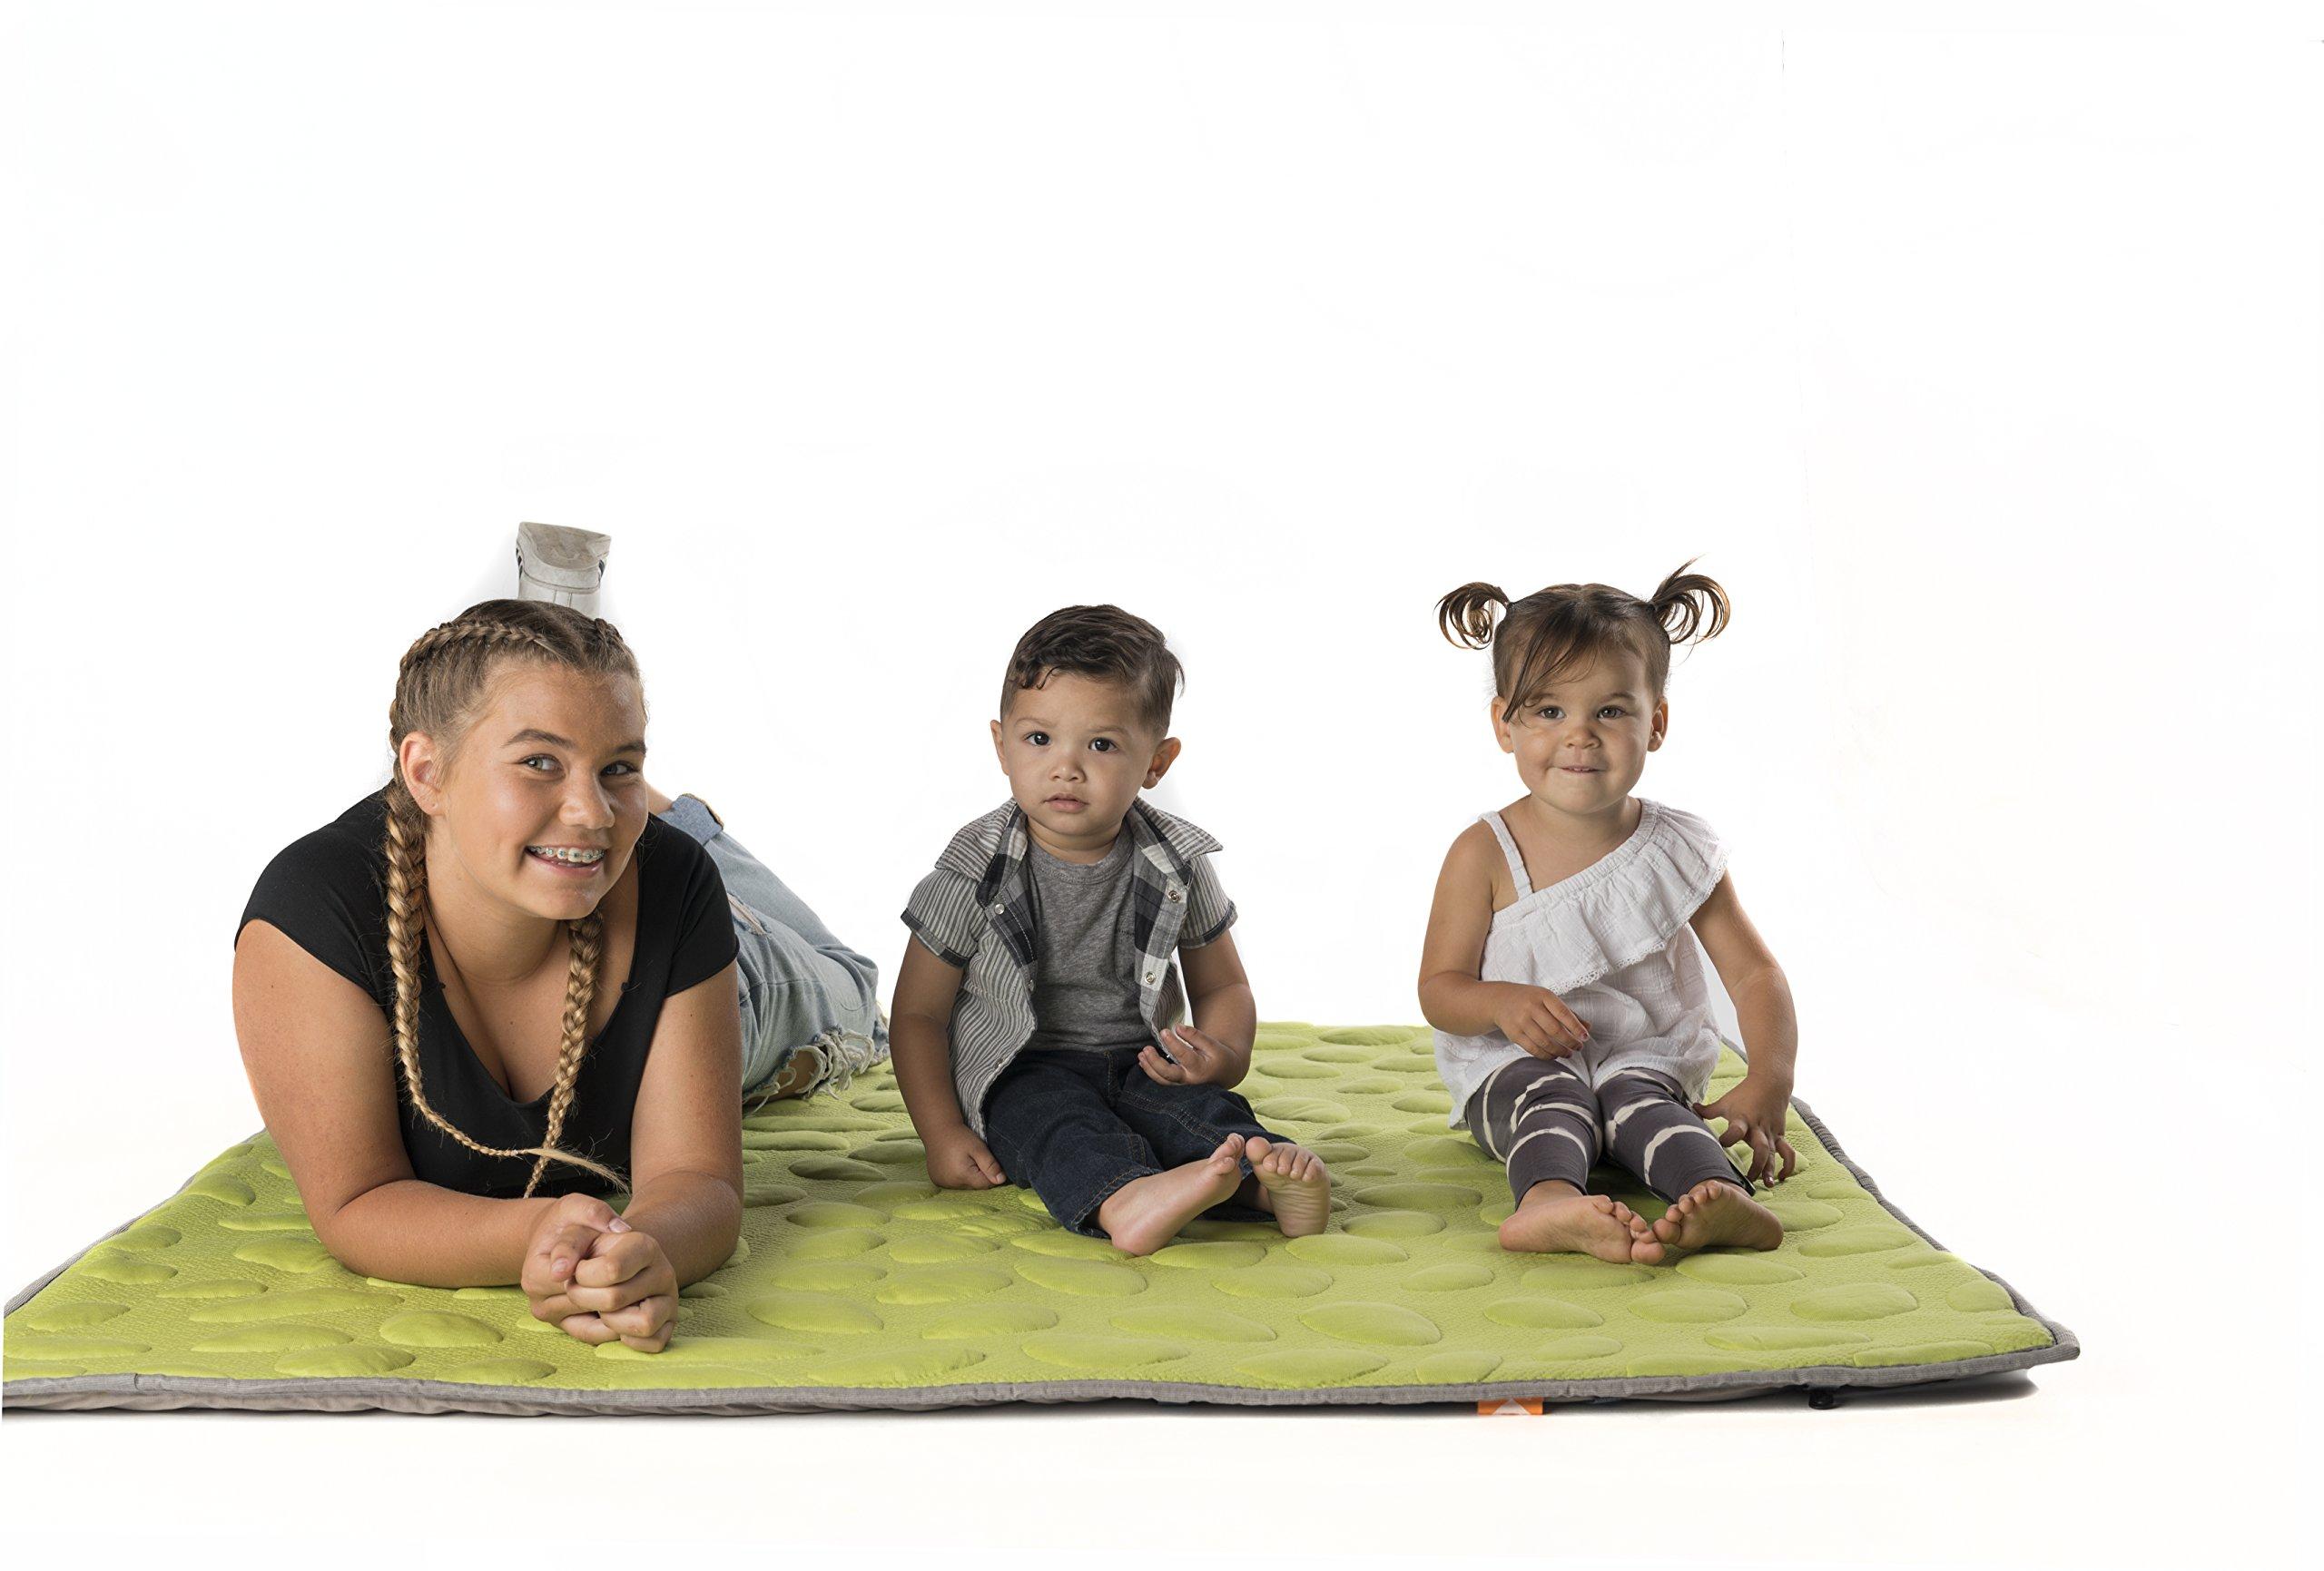 Nook Sleep LilyPad Playmat, Pacific by Nook Sleep (Image #2)